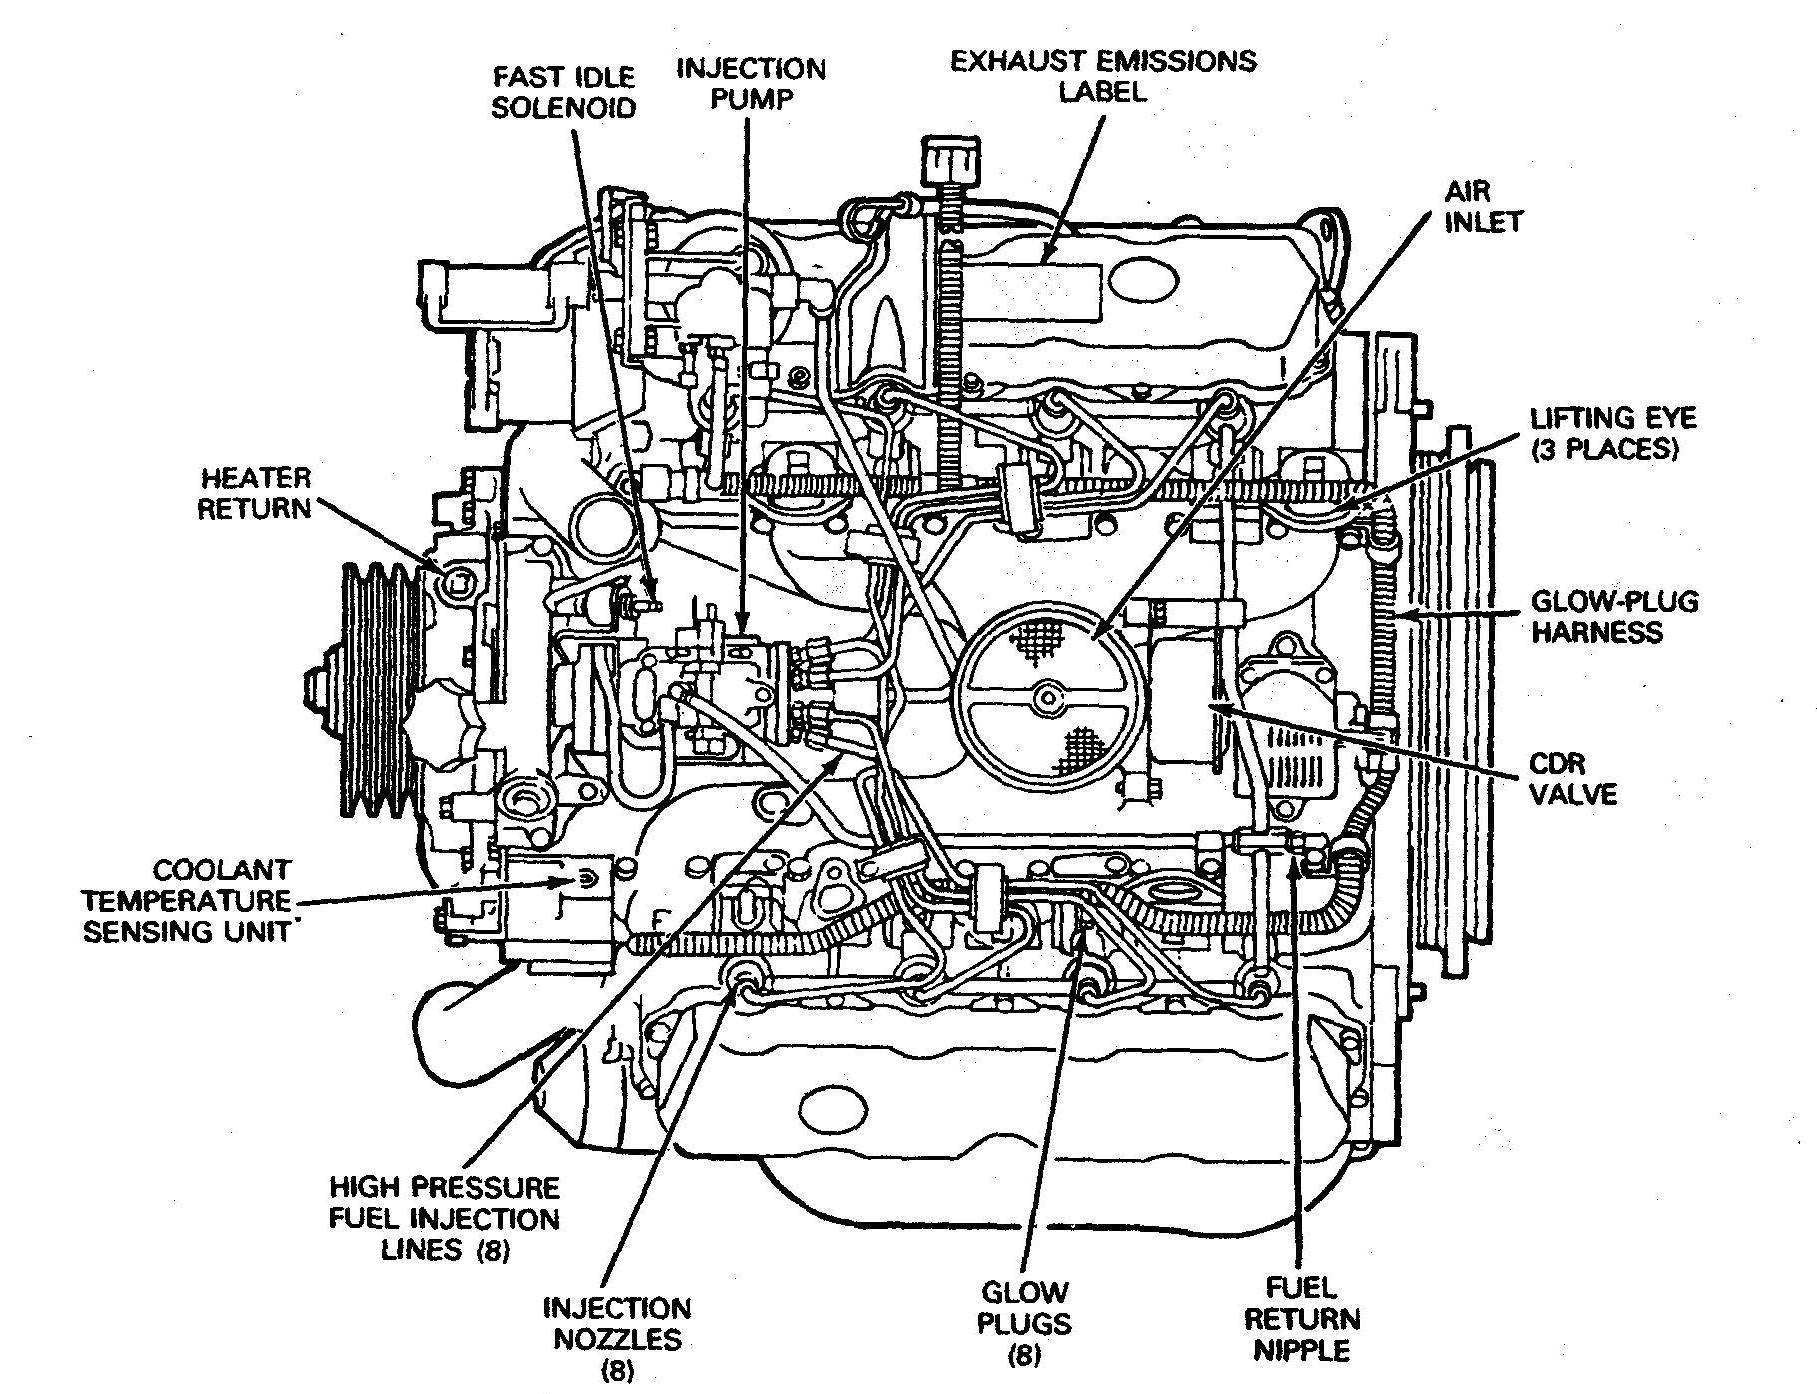 Car Engine Diagrams Free Automotive Engine Diagram Wiring Diagrams Of Car Engine Diagrams Free